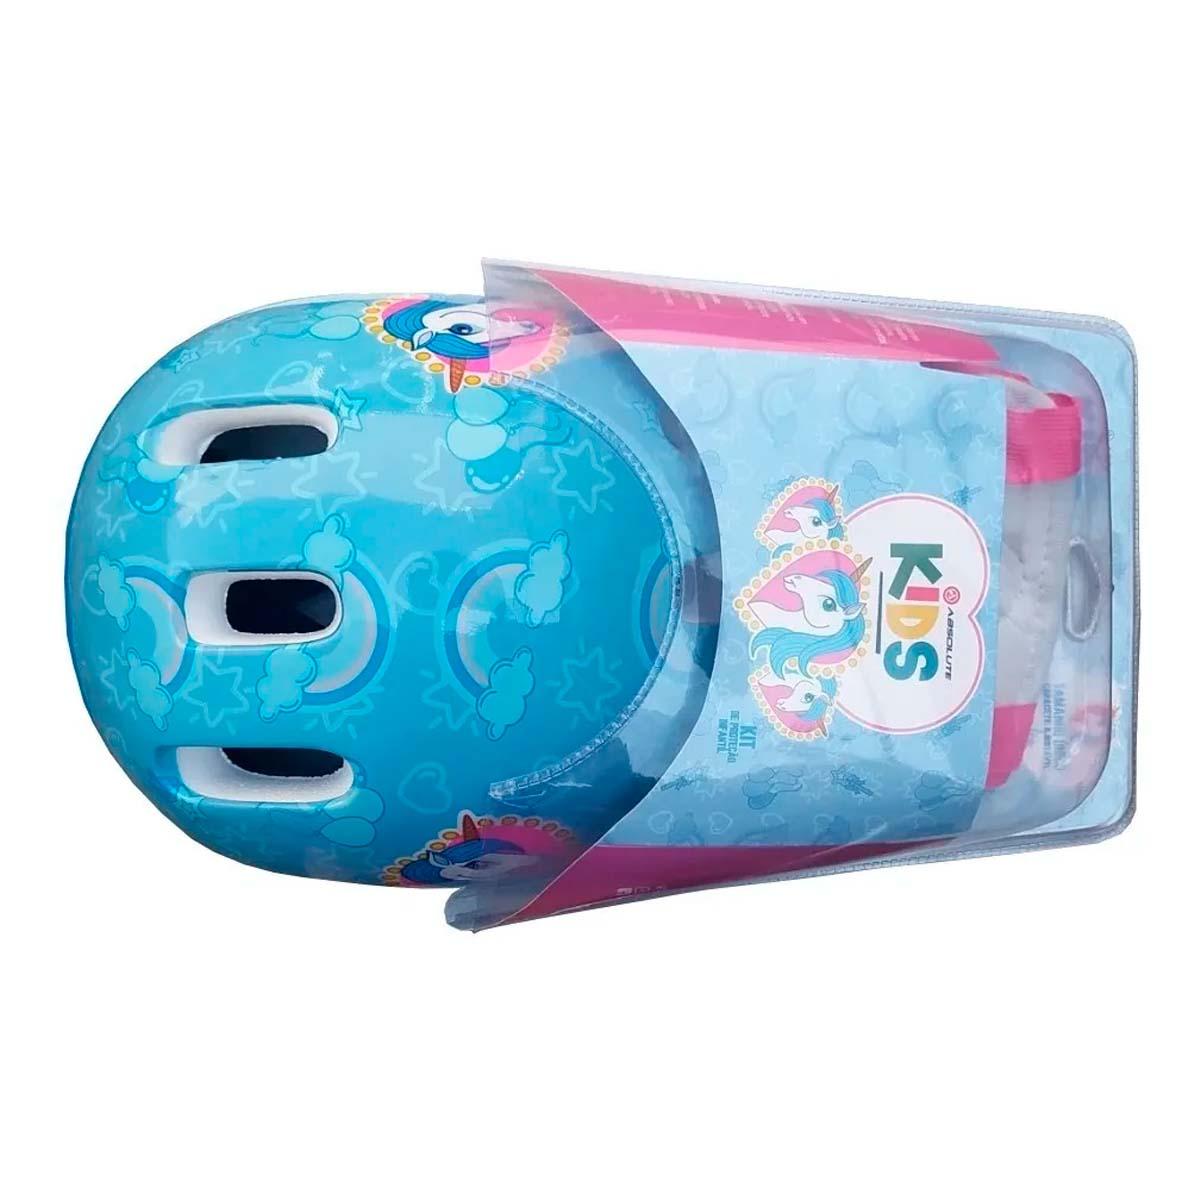 Kit de Protecao Infantil Absolute Kids Unicornio Azul Capacete Joelheira Cotoveleiras Tam Único